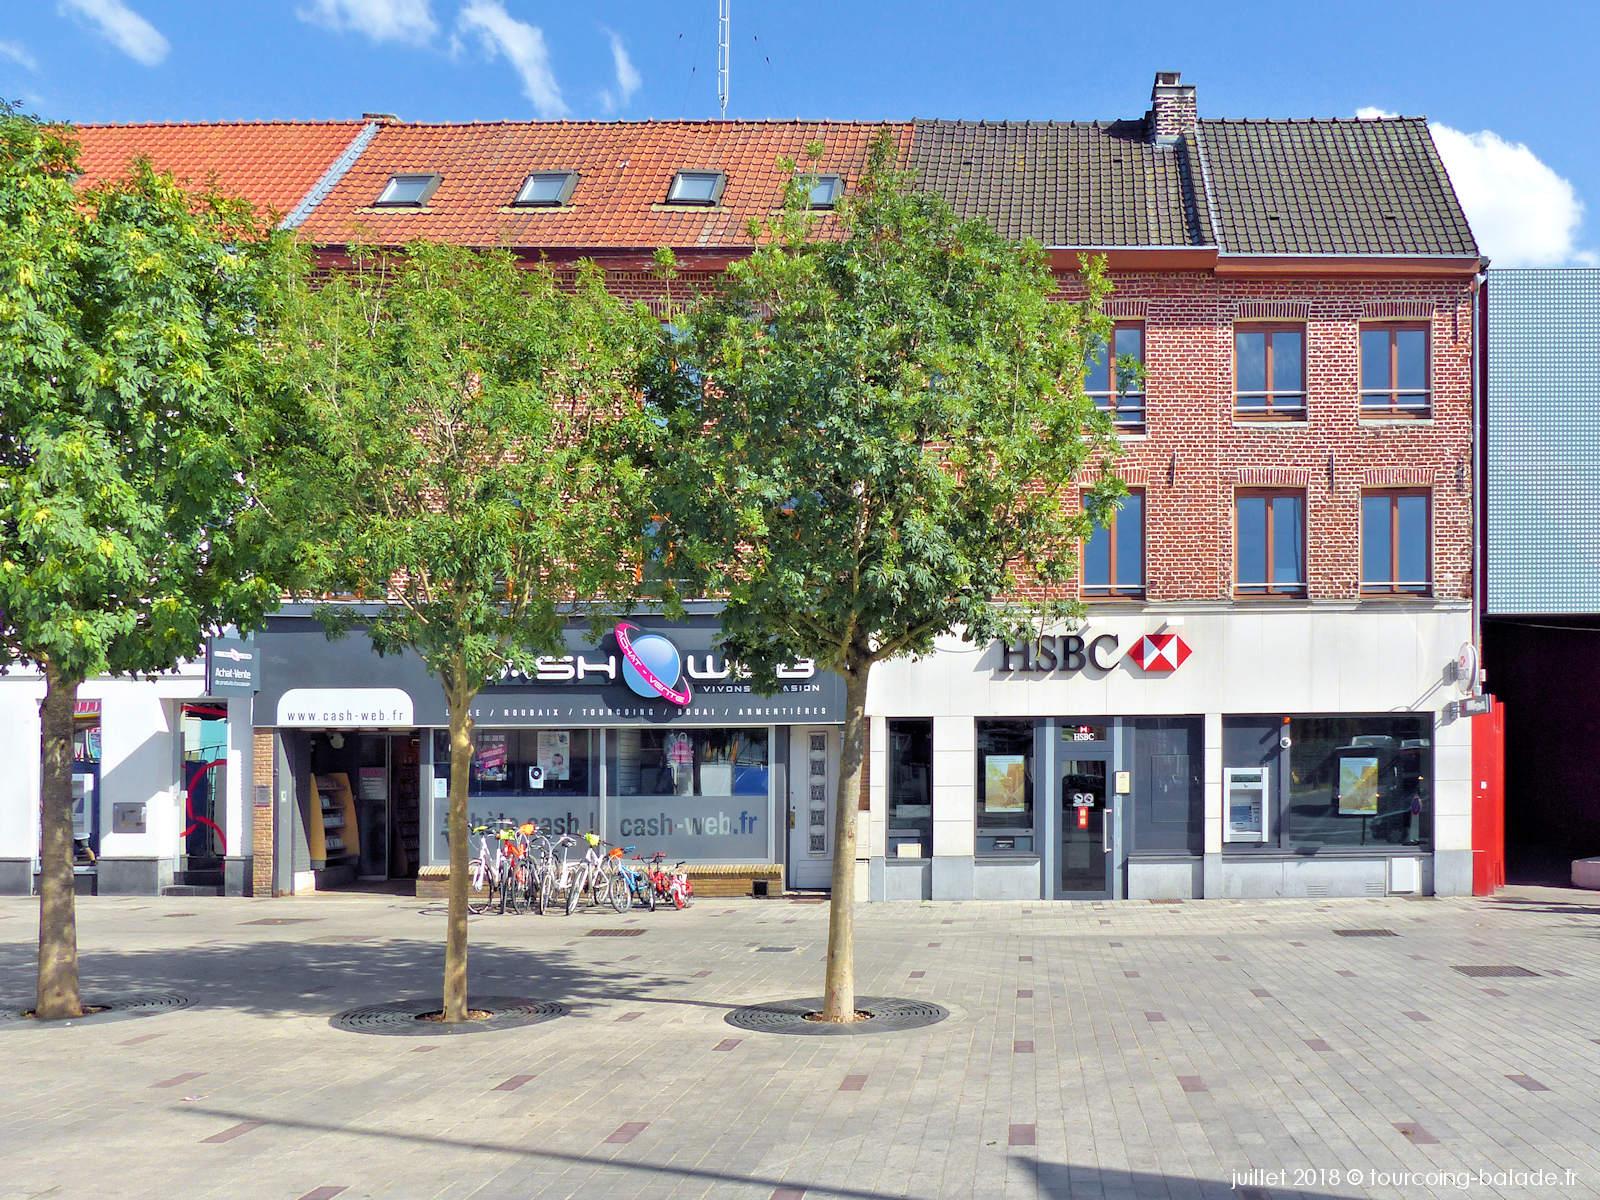 Banque HSBC Tourcoing centre ville.